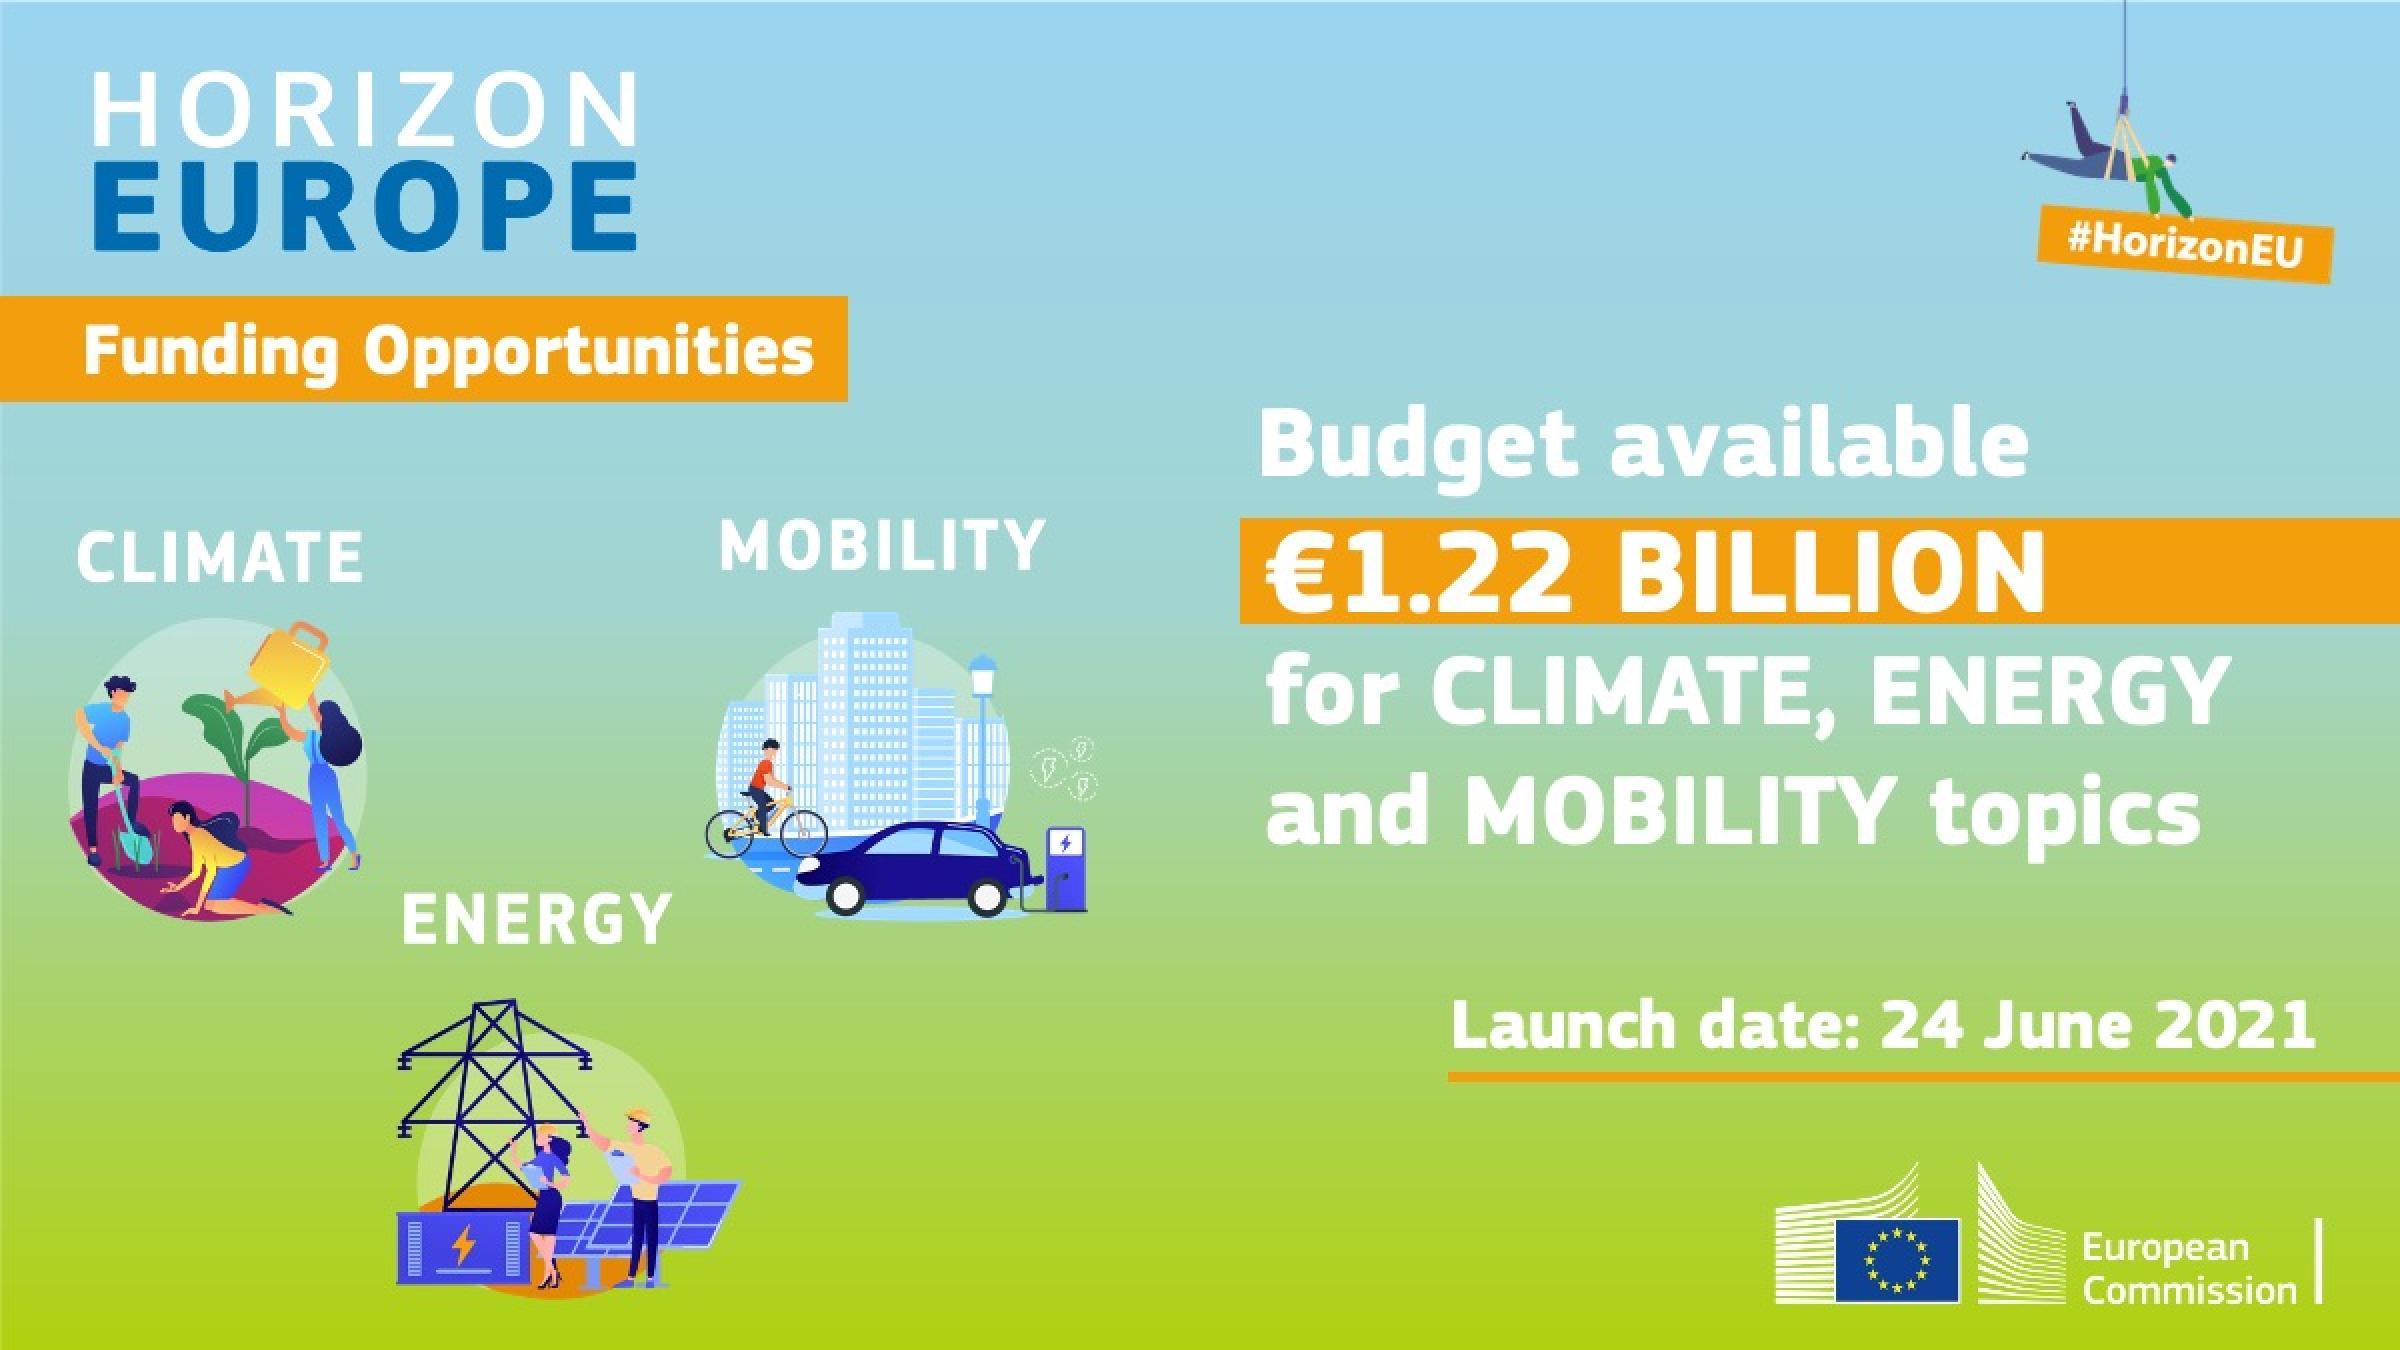 klíma, mobilita, energetika